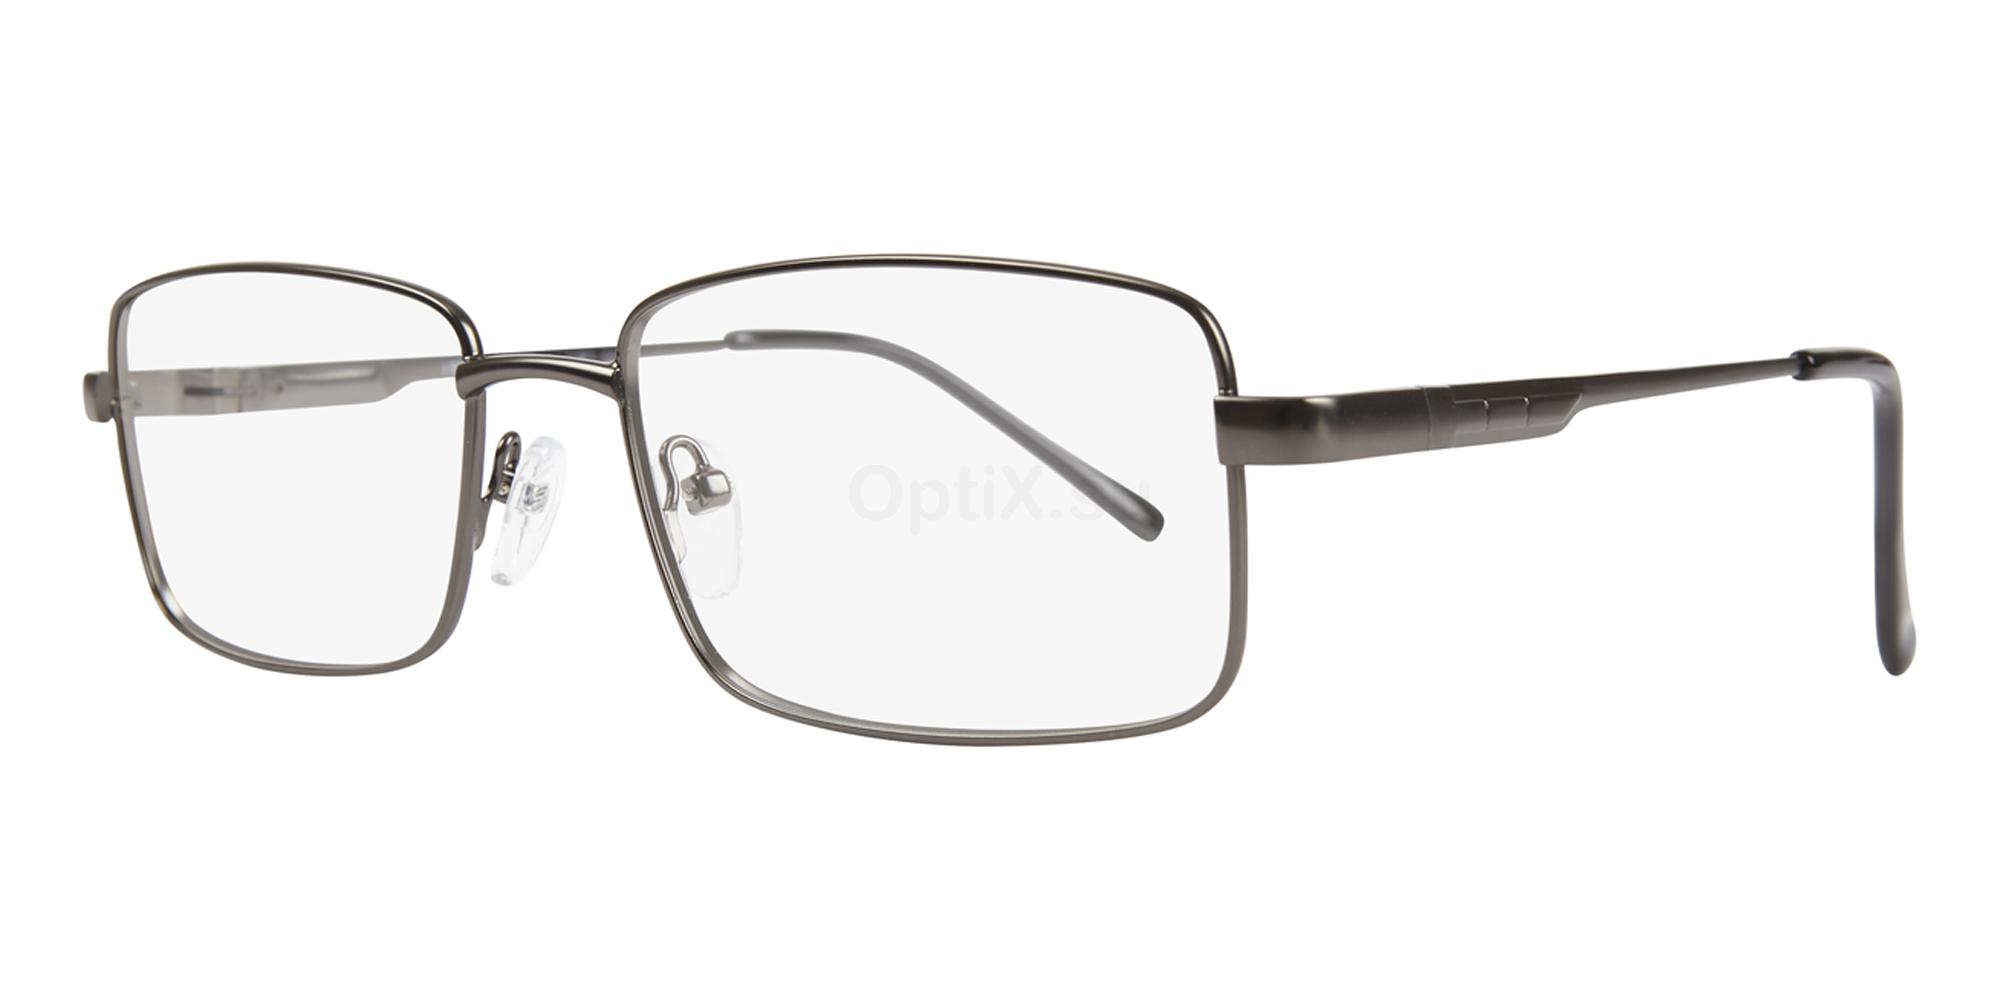 C1 Complete 2 Mod 8 Glasses, Complete